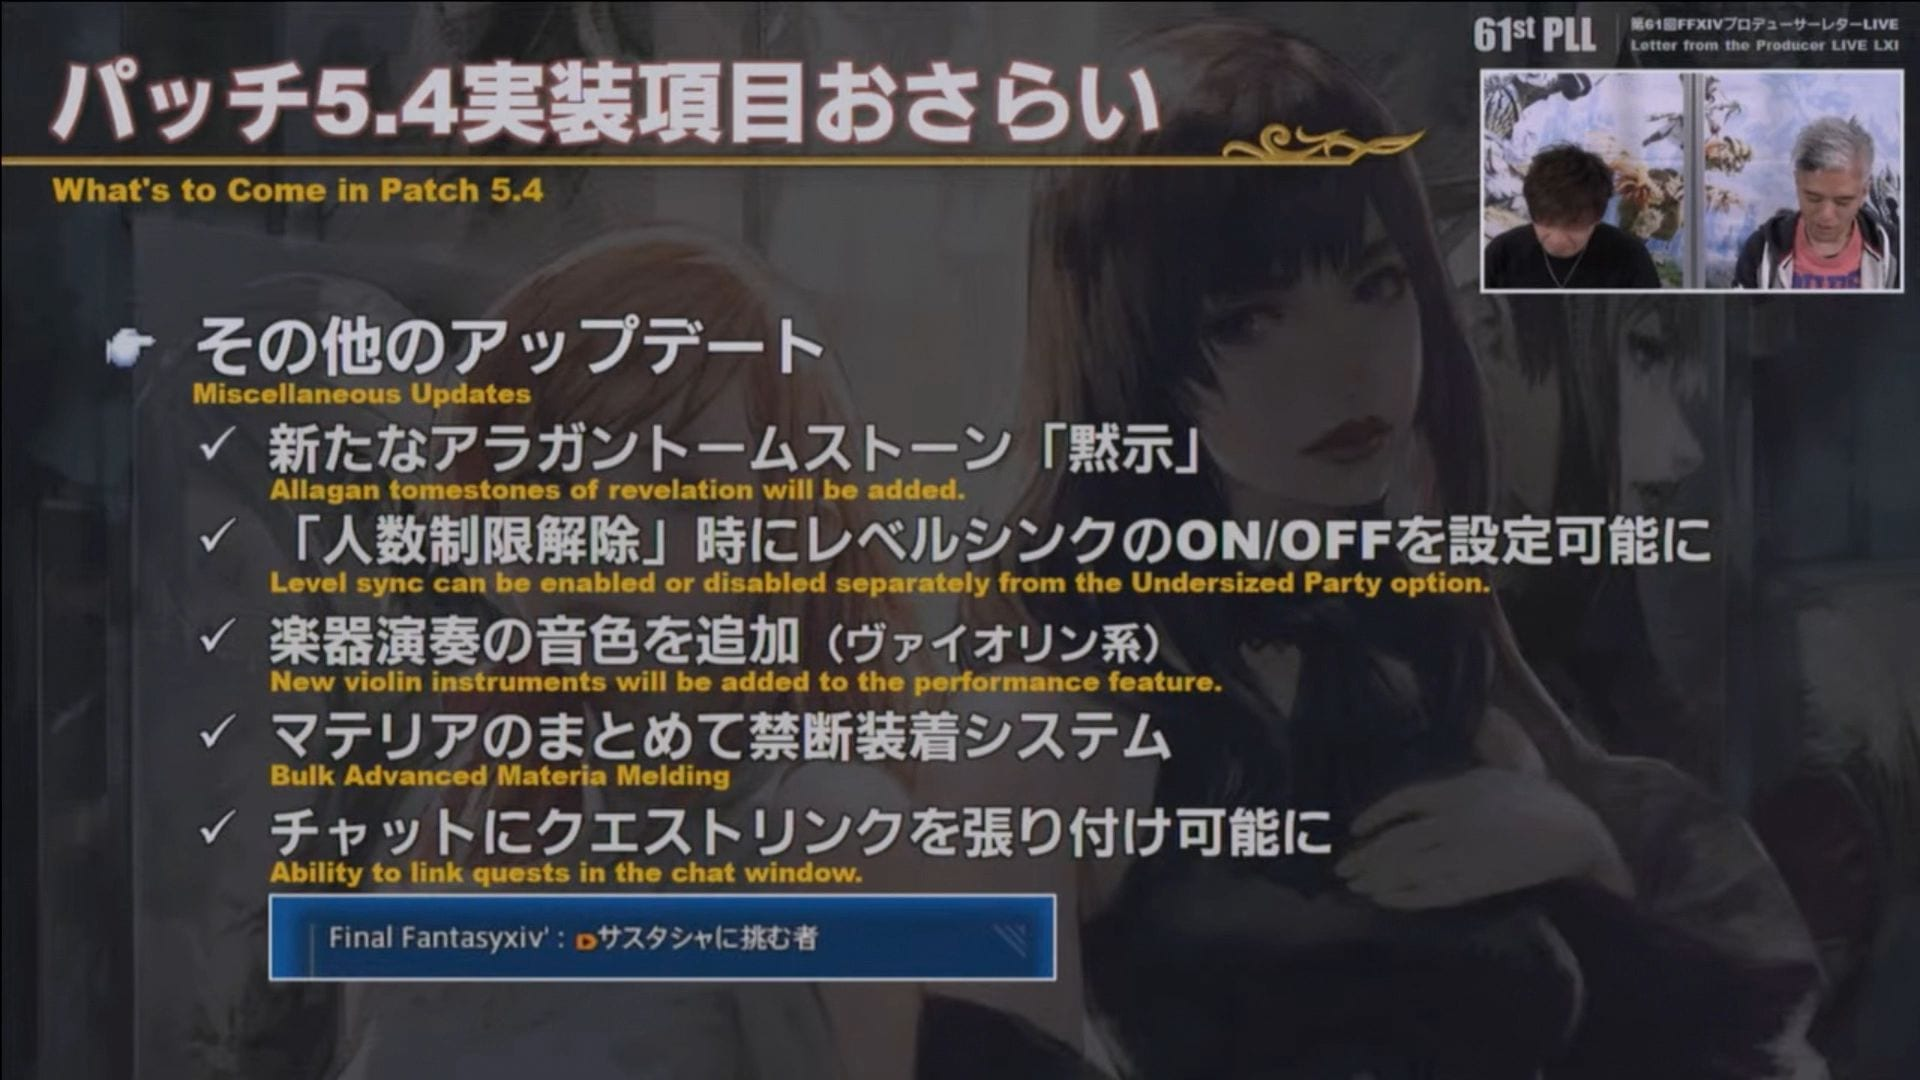 Final-Fantasy-XIV-Screenshot-2020-11-27-13-32-33.jpg